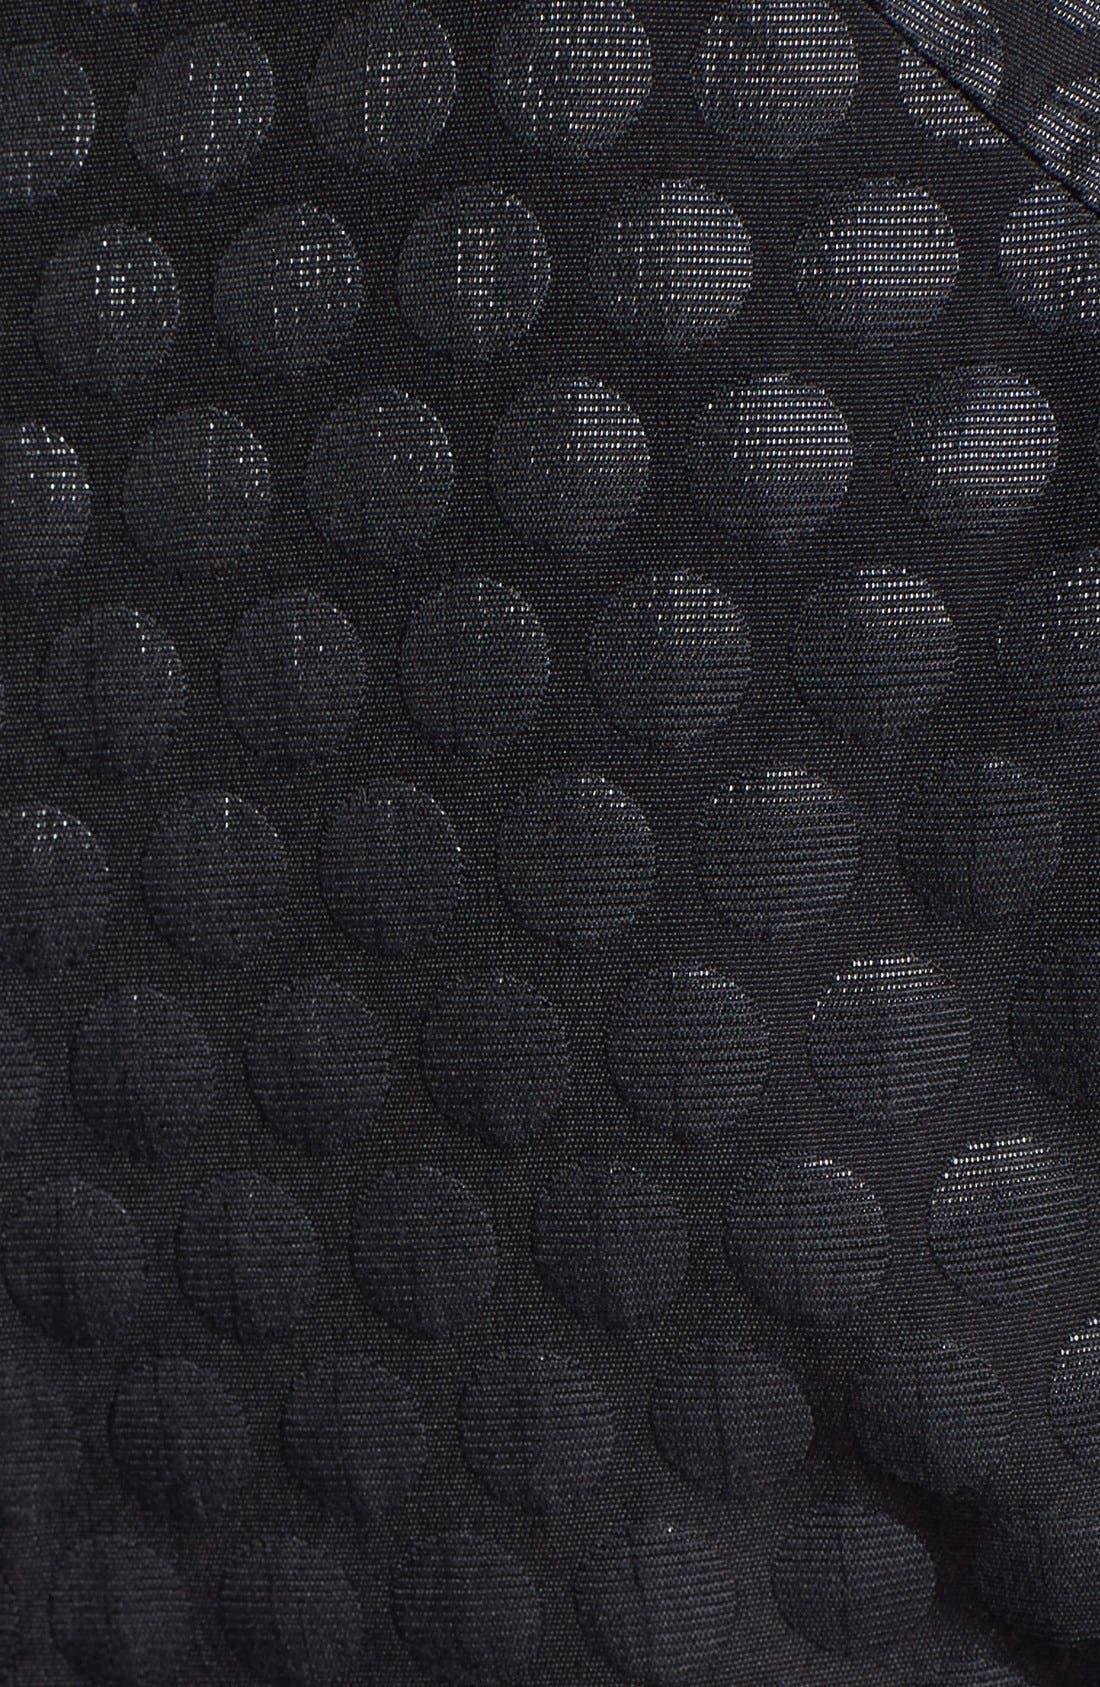 Alternate Image 3  - Vince Camuto Dot Pattern Peplum Top